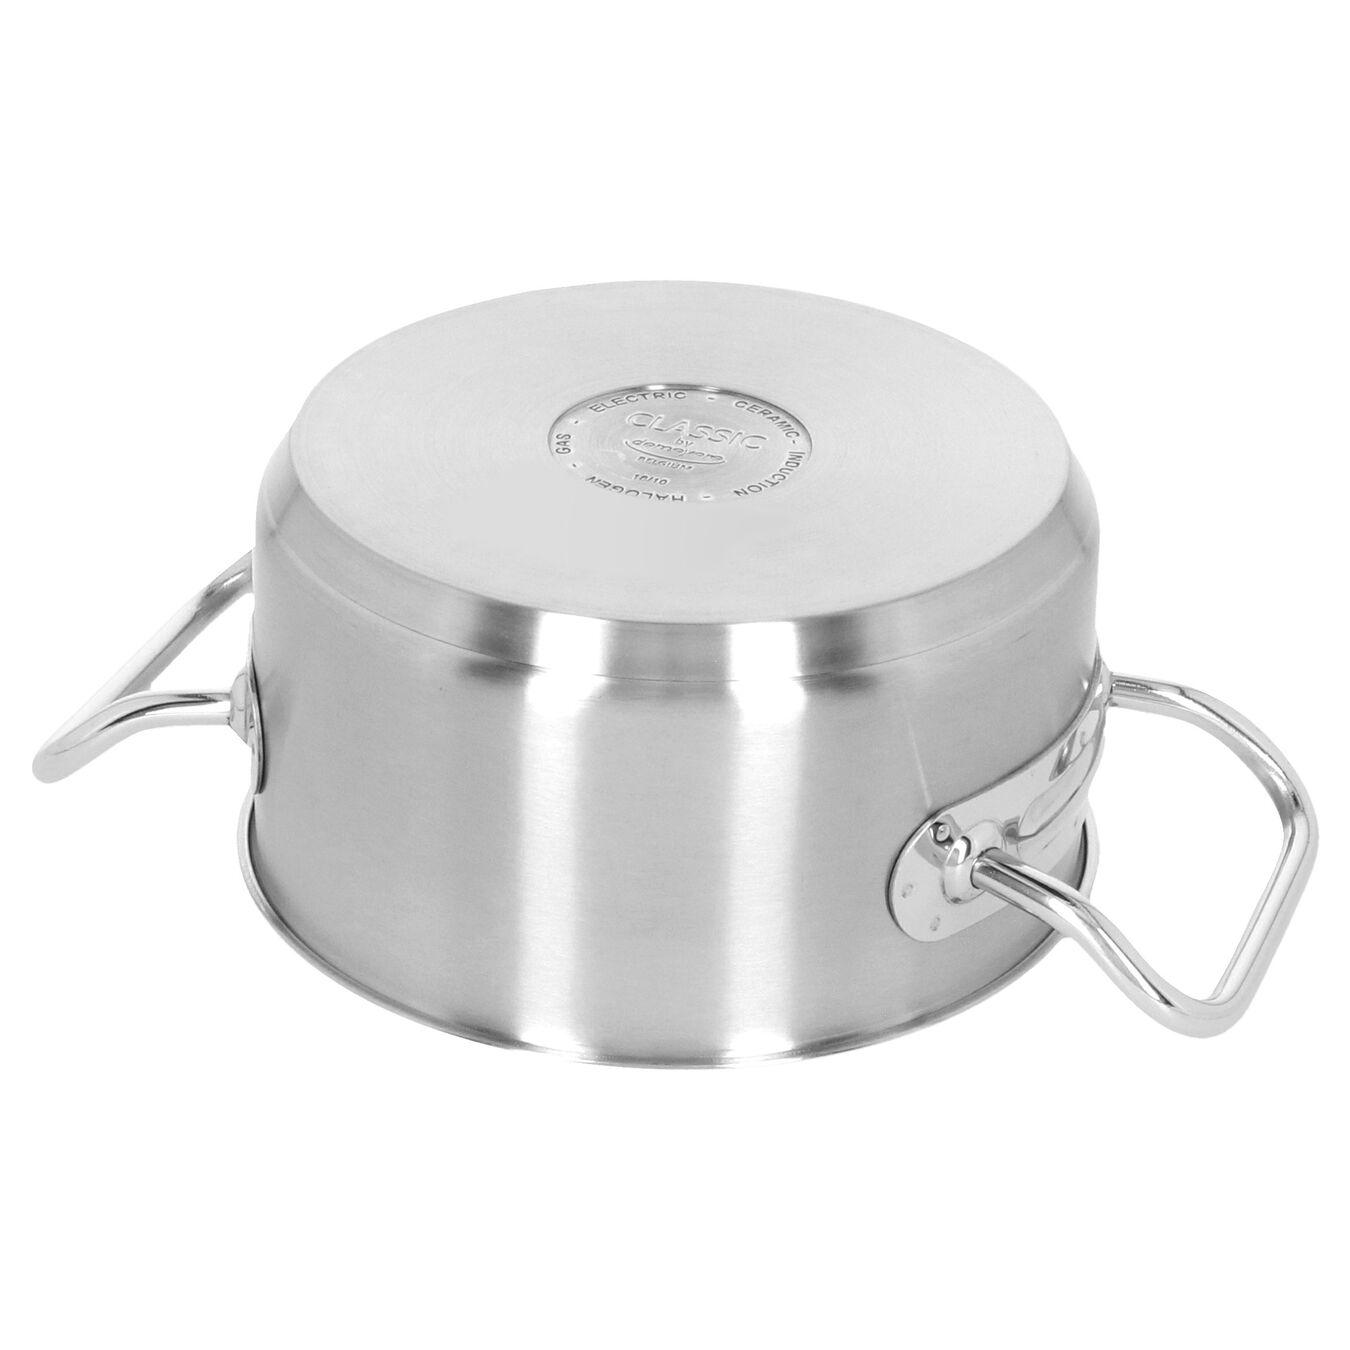 Kookpot met deksel 16 cm / 1,5 l,,large 5